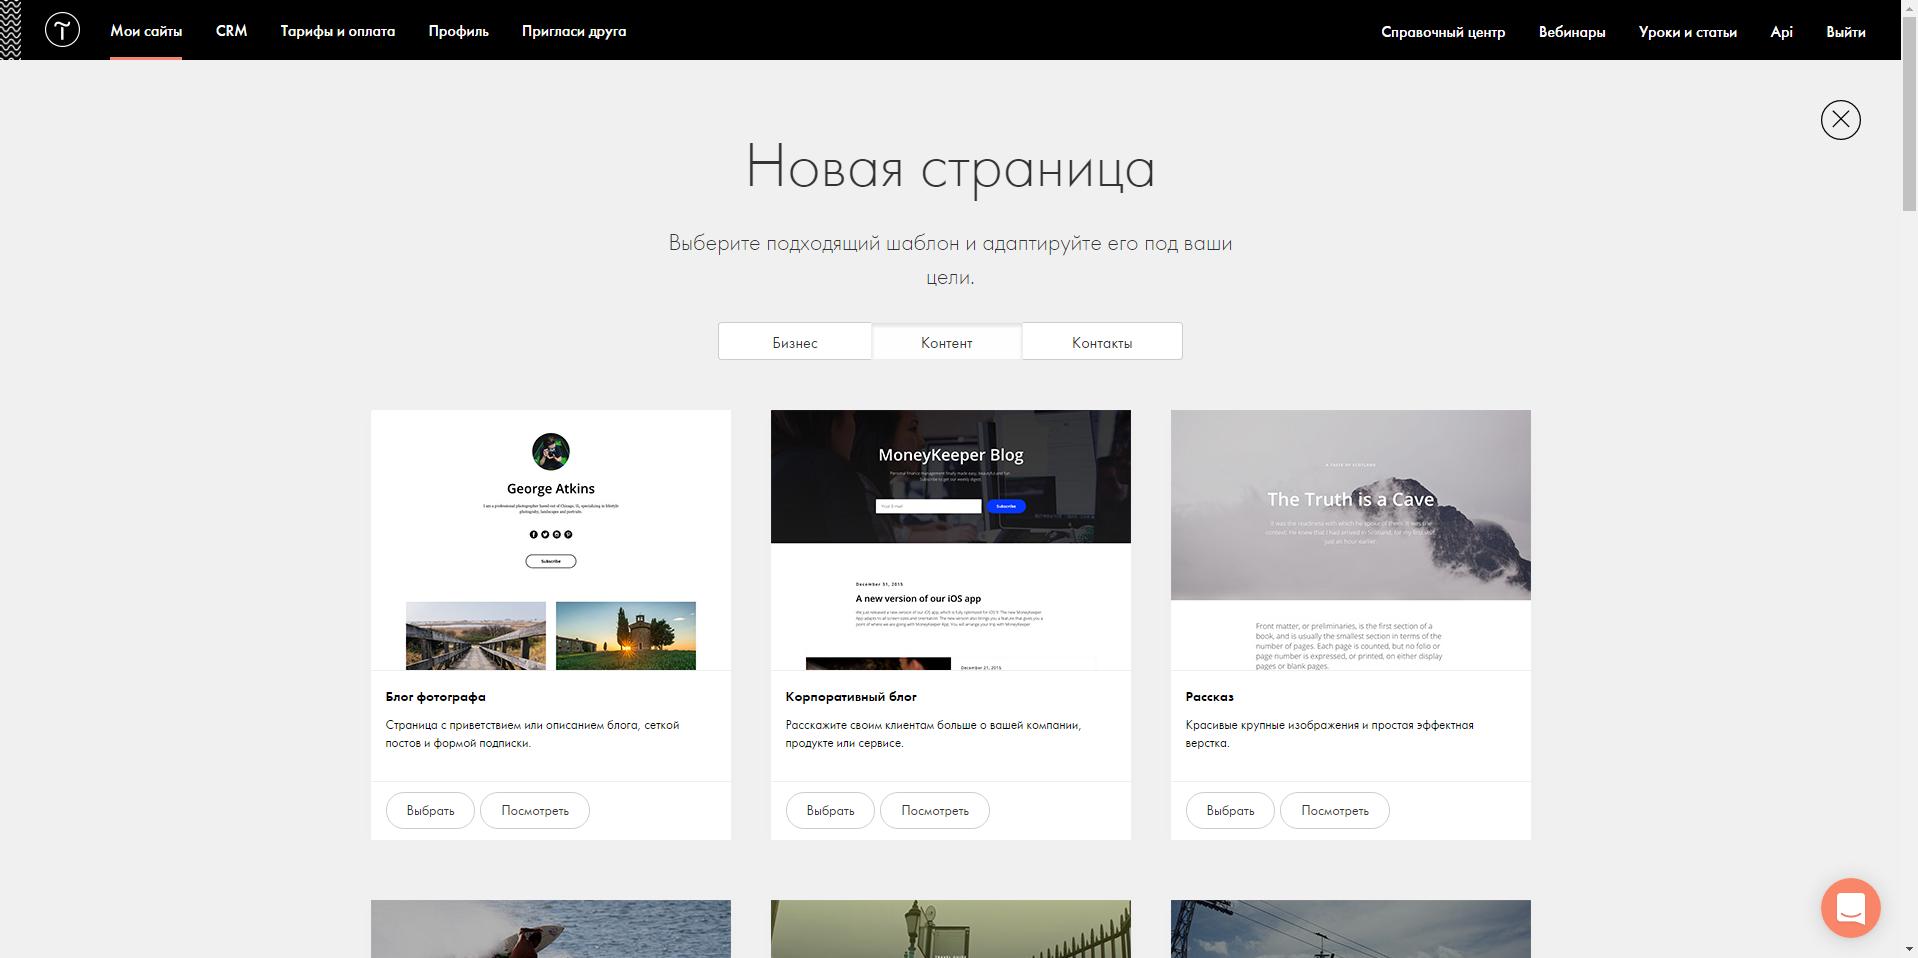 a3ed35125 33 лучших онлайн-конструктора сайтов, презентаций, визиток и многого ...